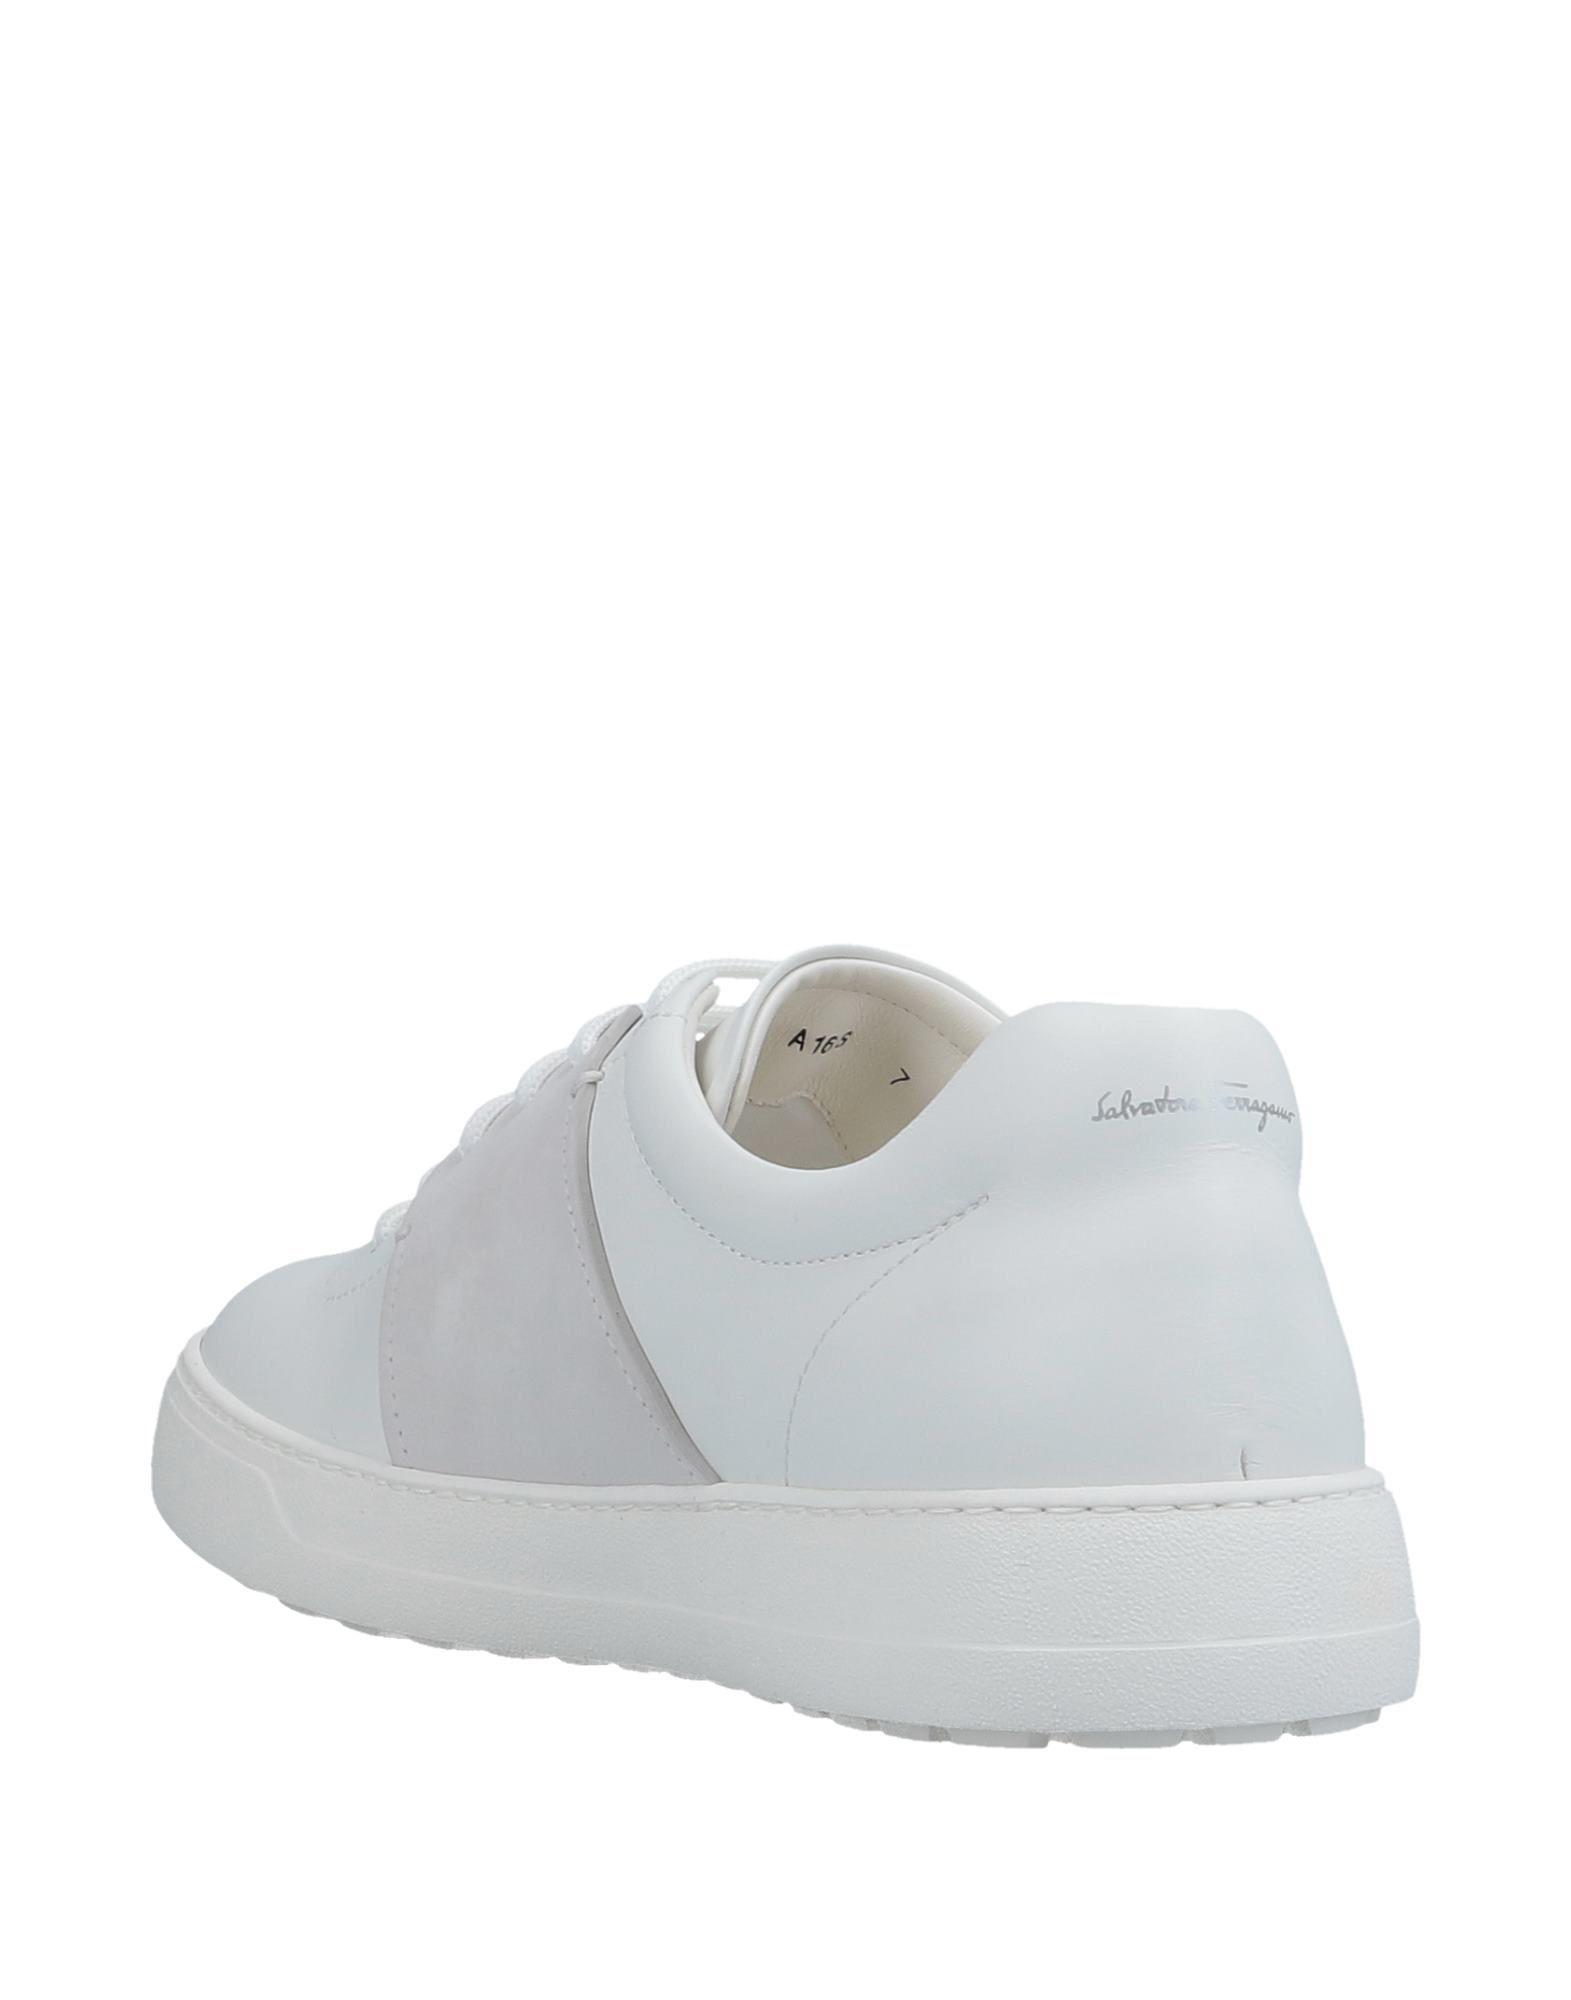 Salvatore Ferragamo Sneakers Herren  11510282SS Neue Schuhe